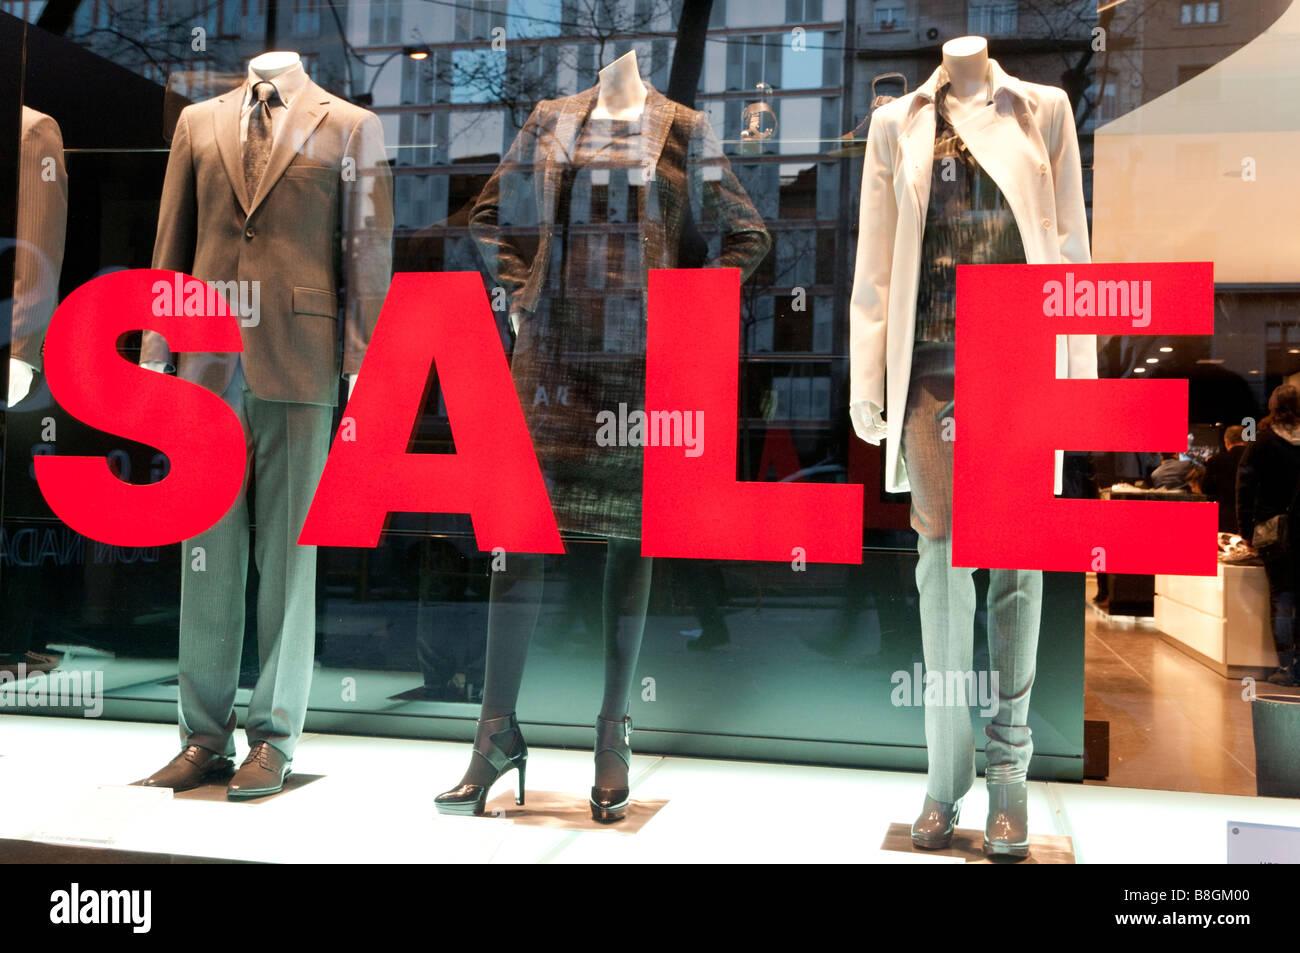 Big sales sign in shop window, Spain - Stock Image